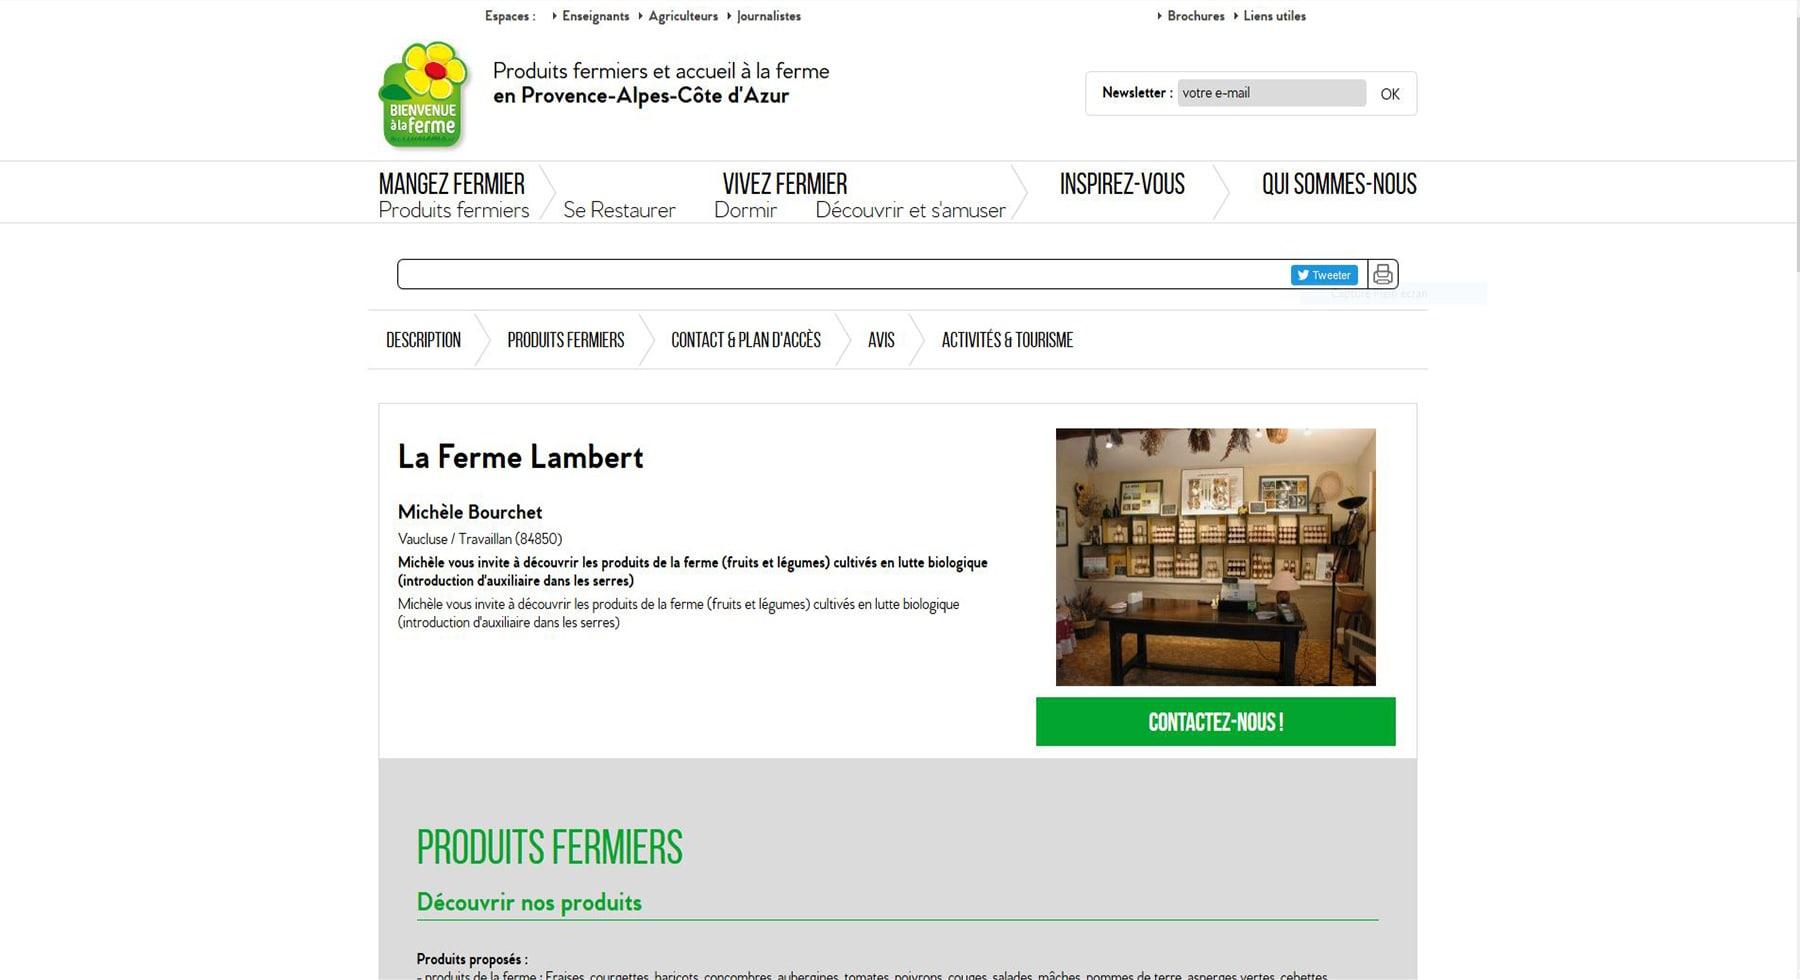 La ferme Lambert